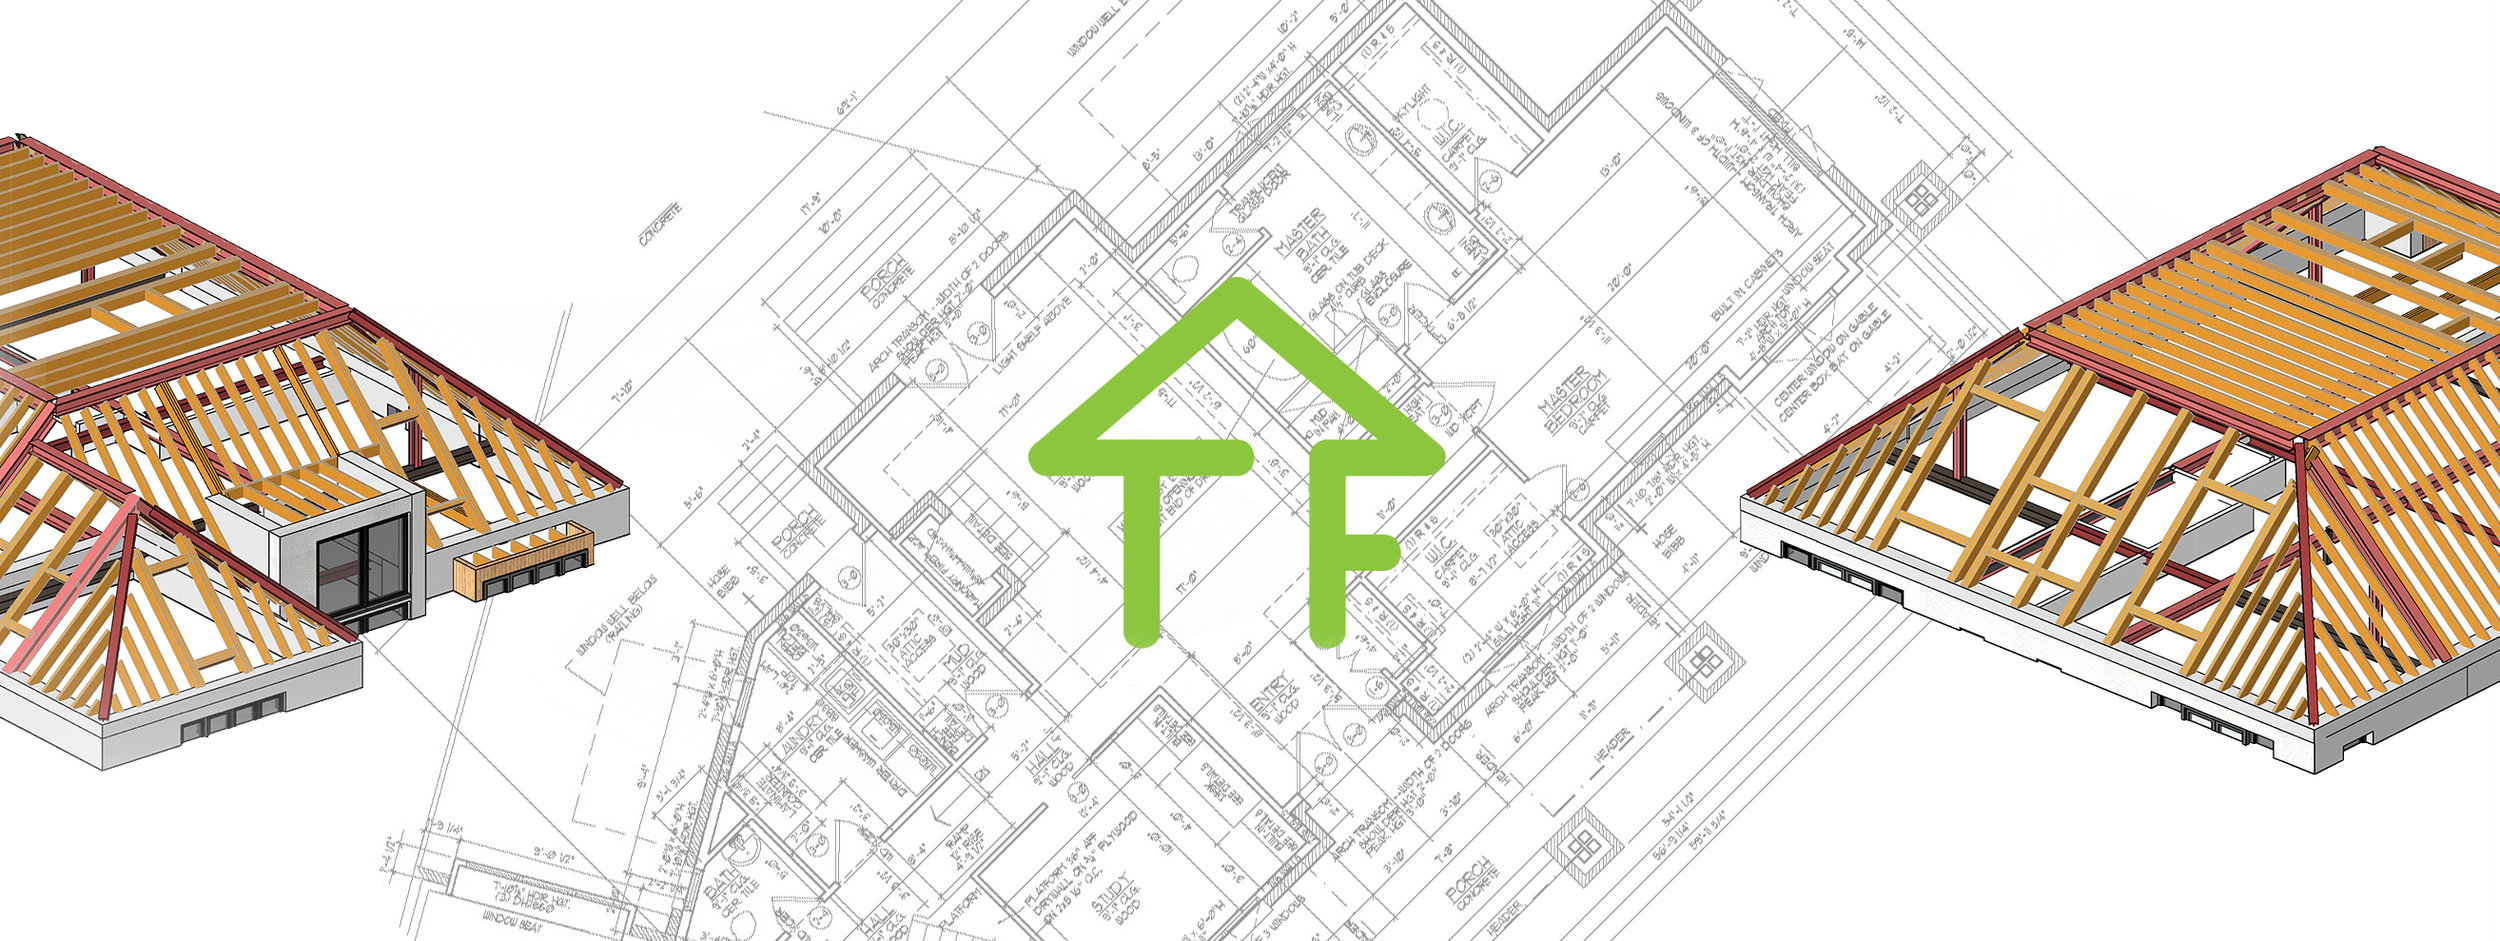 TF Design_2.jpg